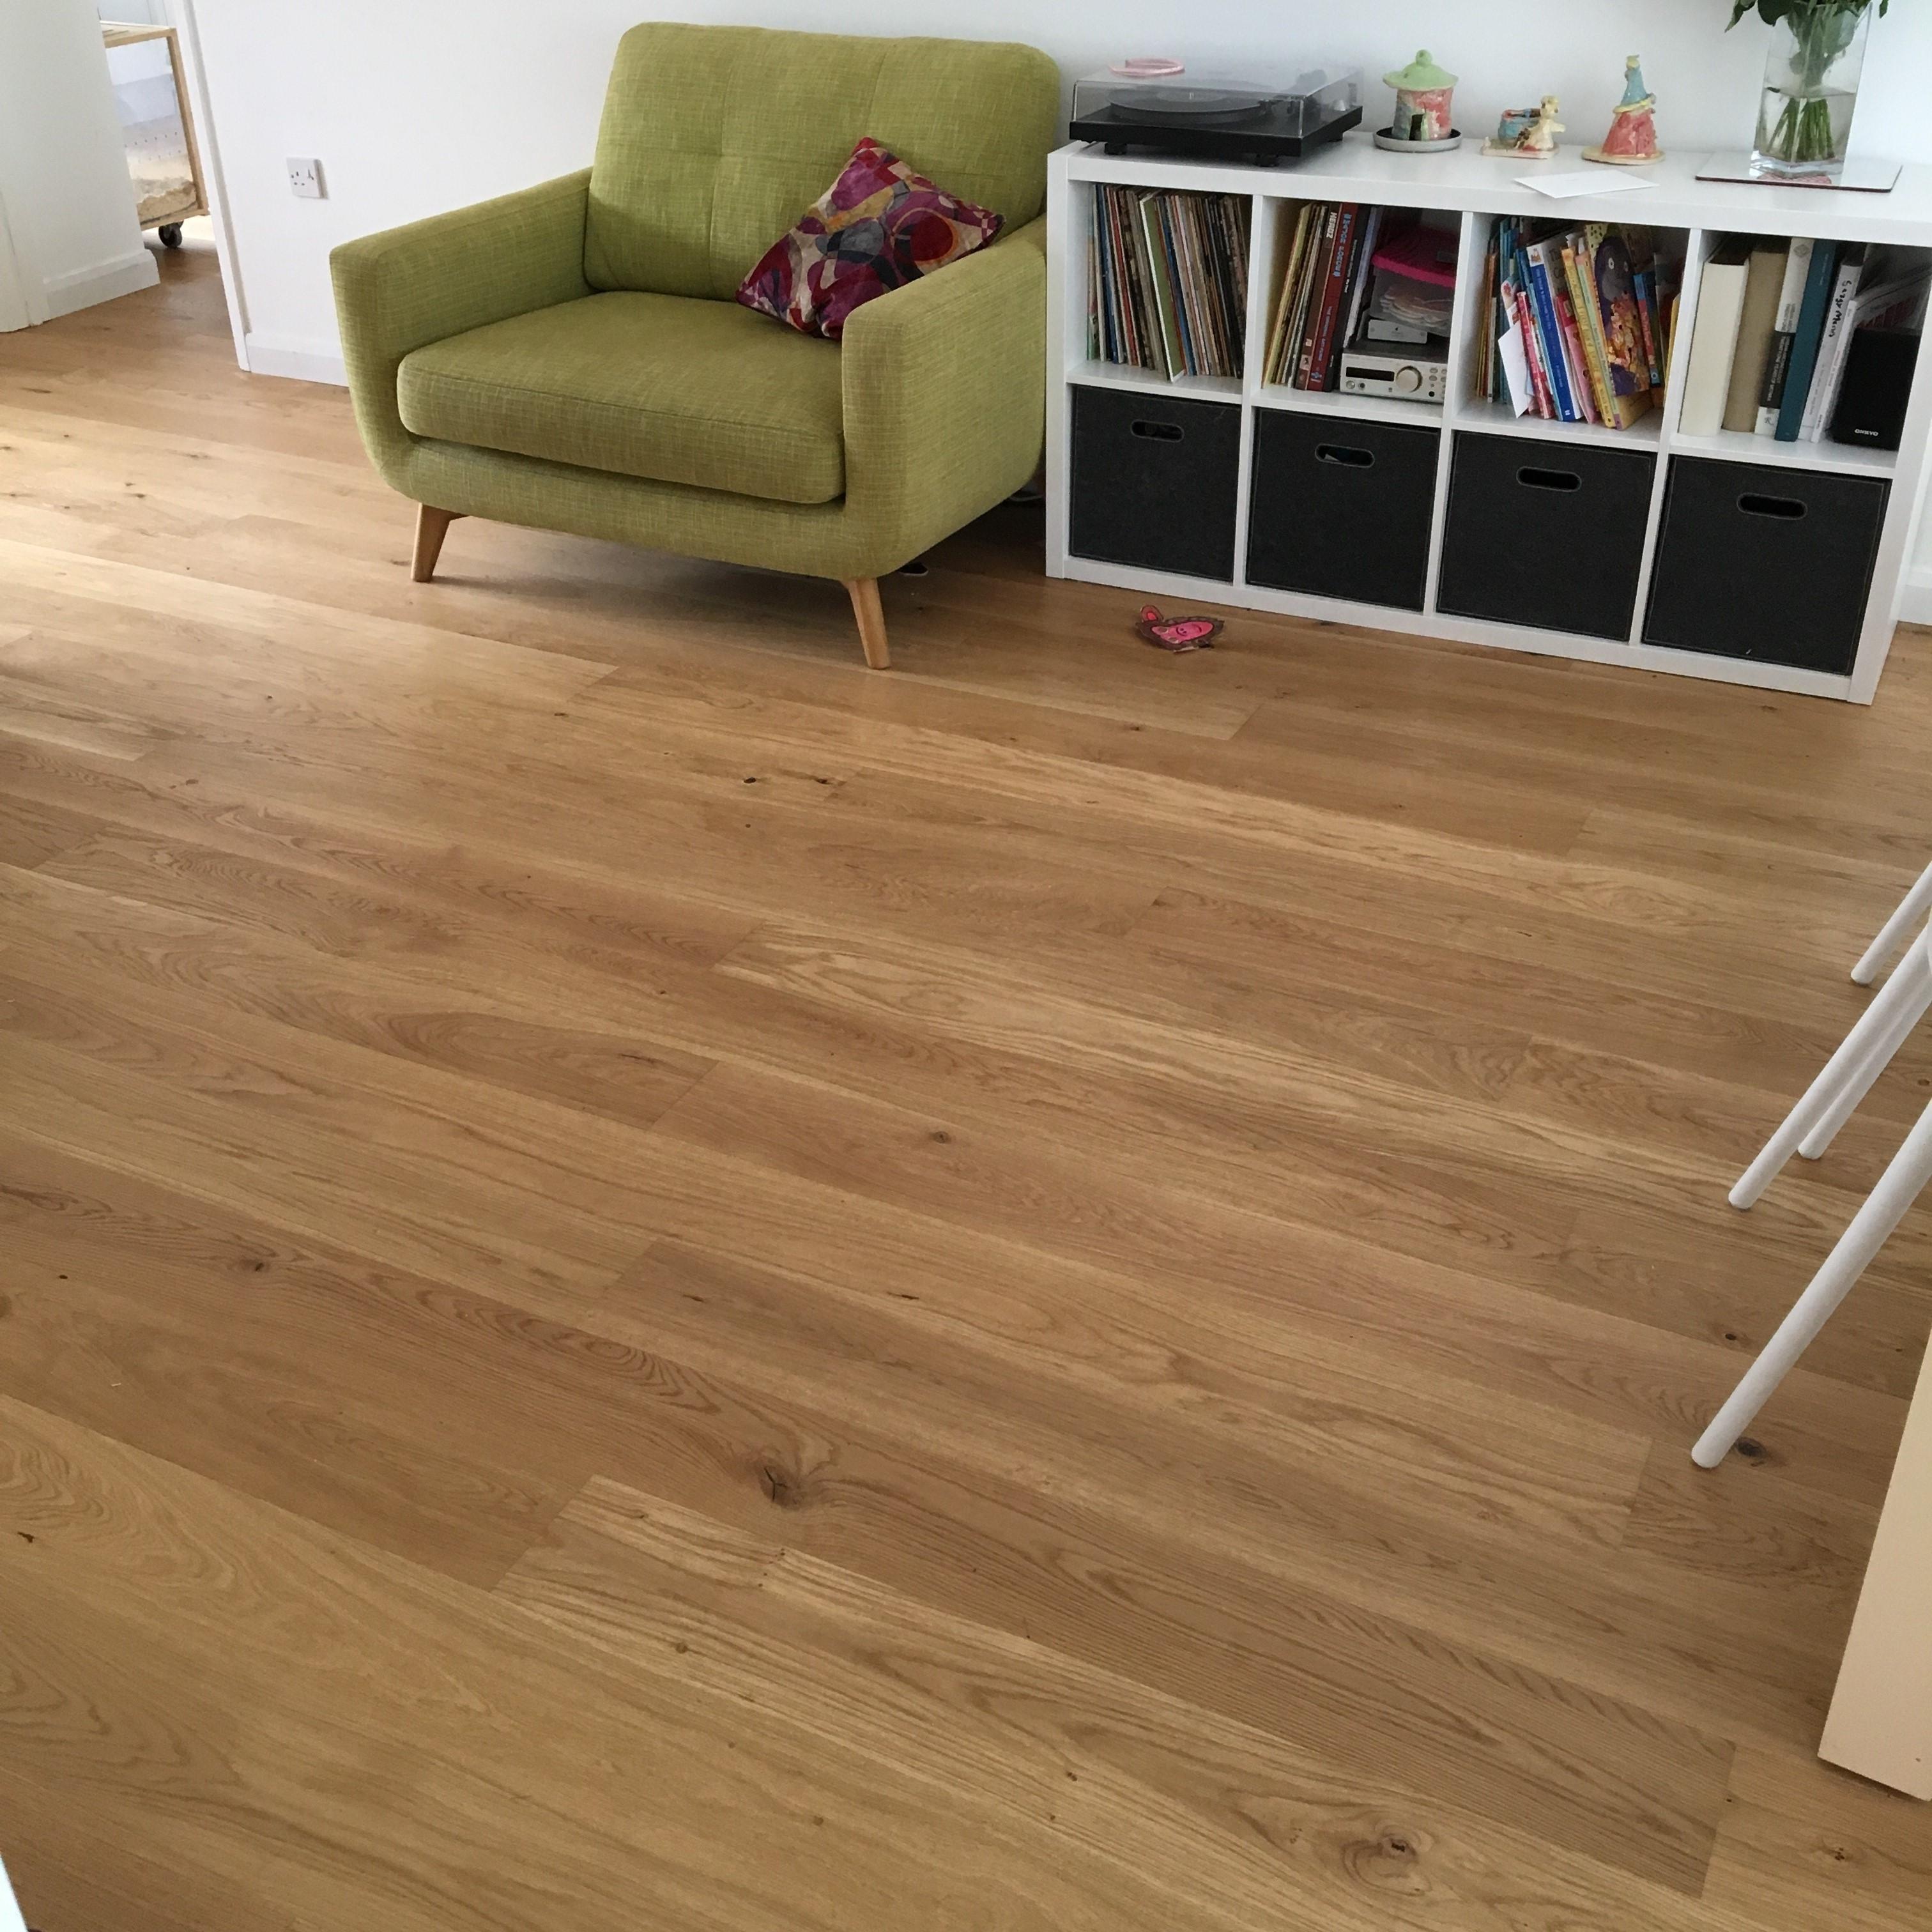 Tarkett European Oak Rustic Hardwax Oil Engineered Wood Flooring